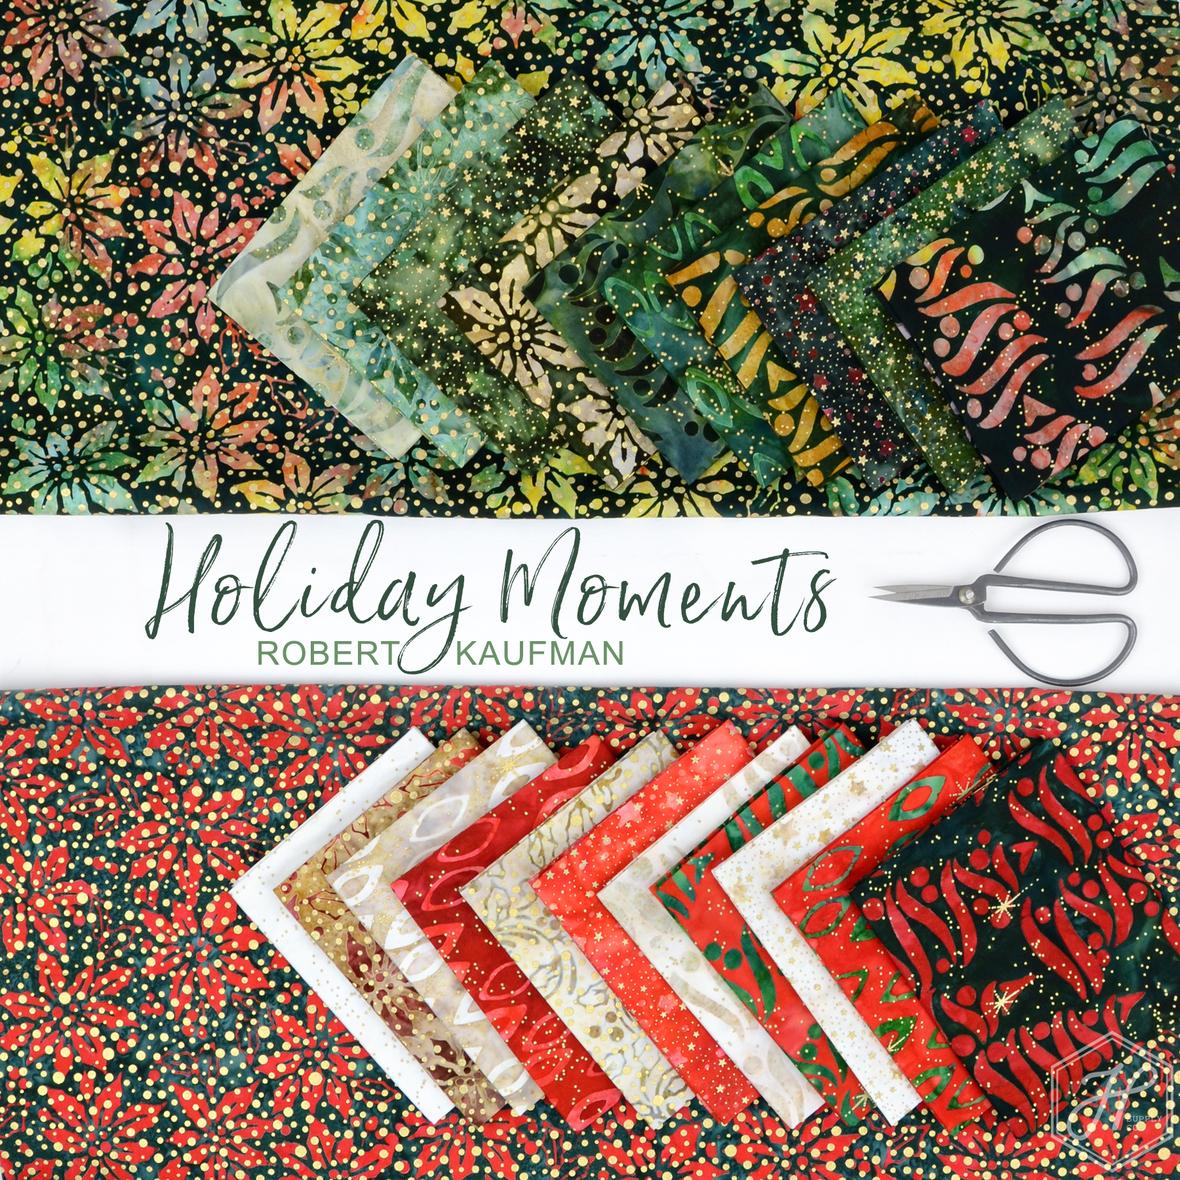 Holiday Moments Robert Kaufman Lunn Studios Batic fabric at Hawthorne Supply Co